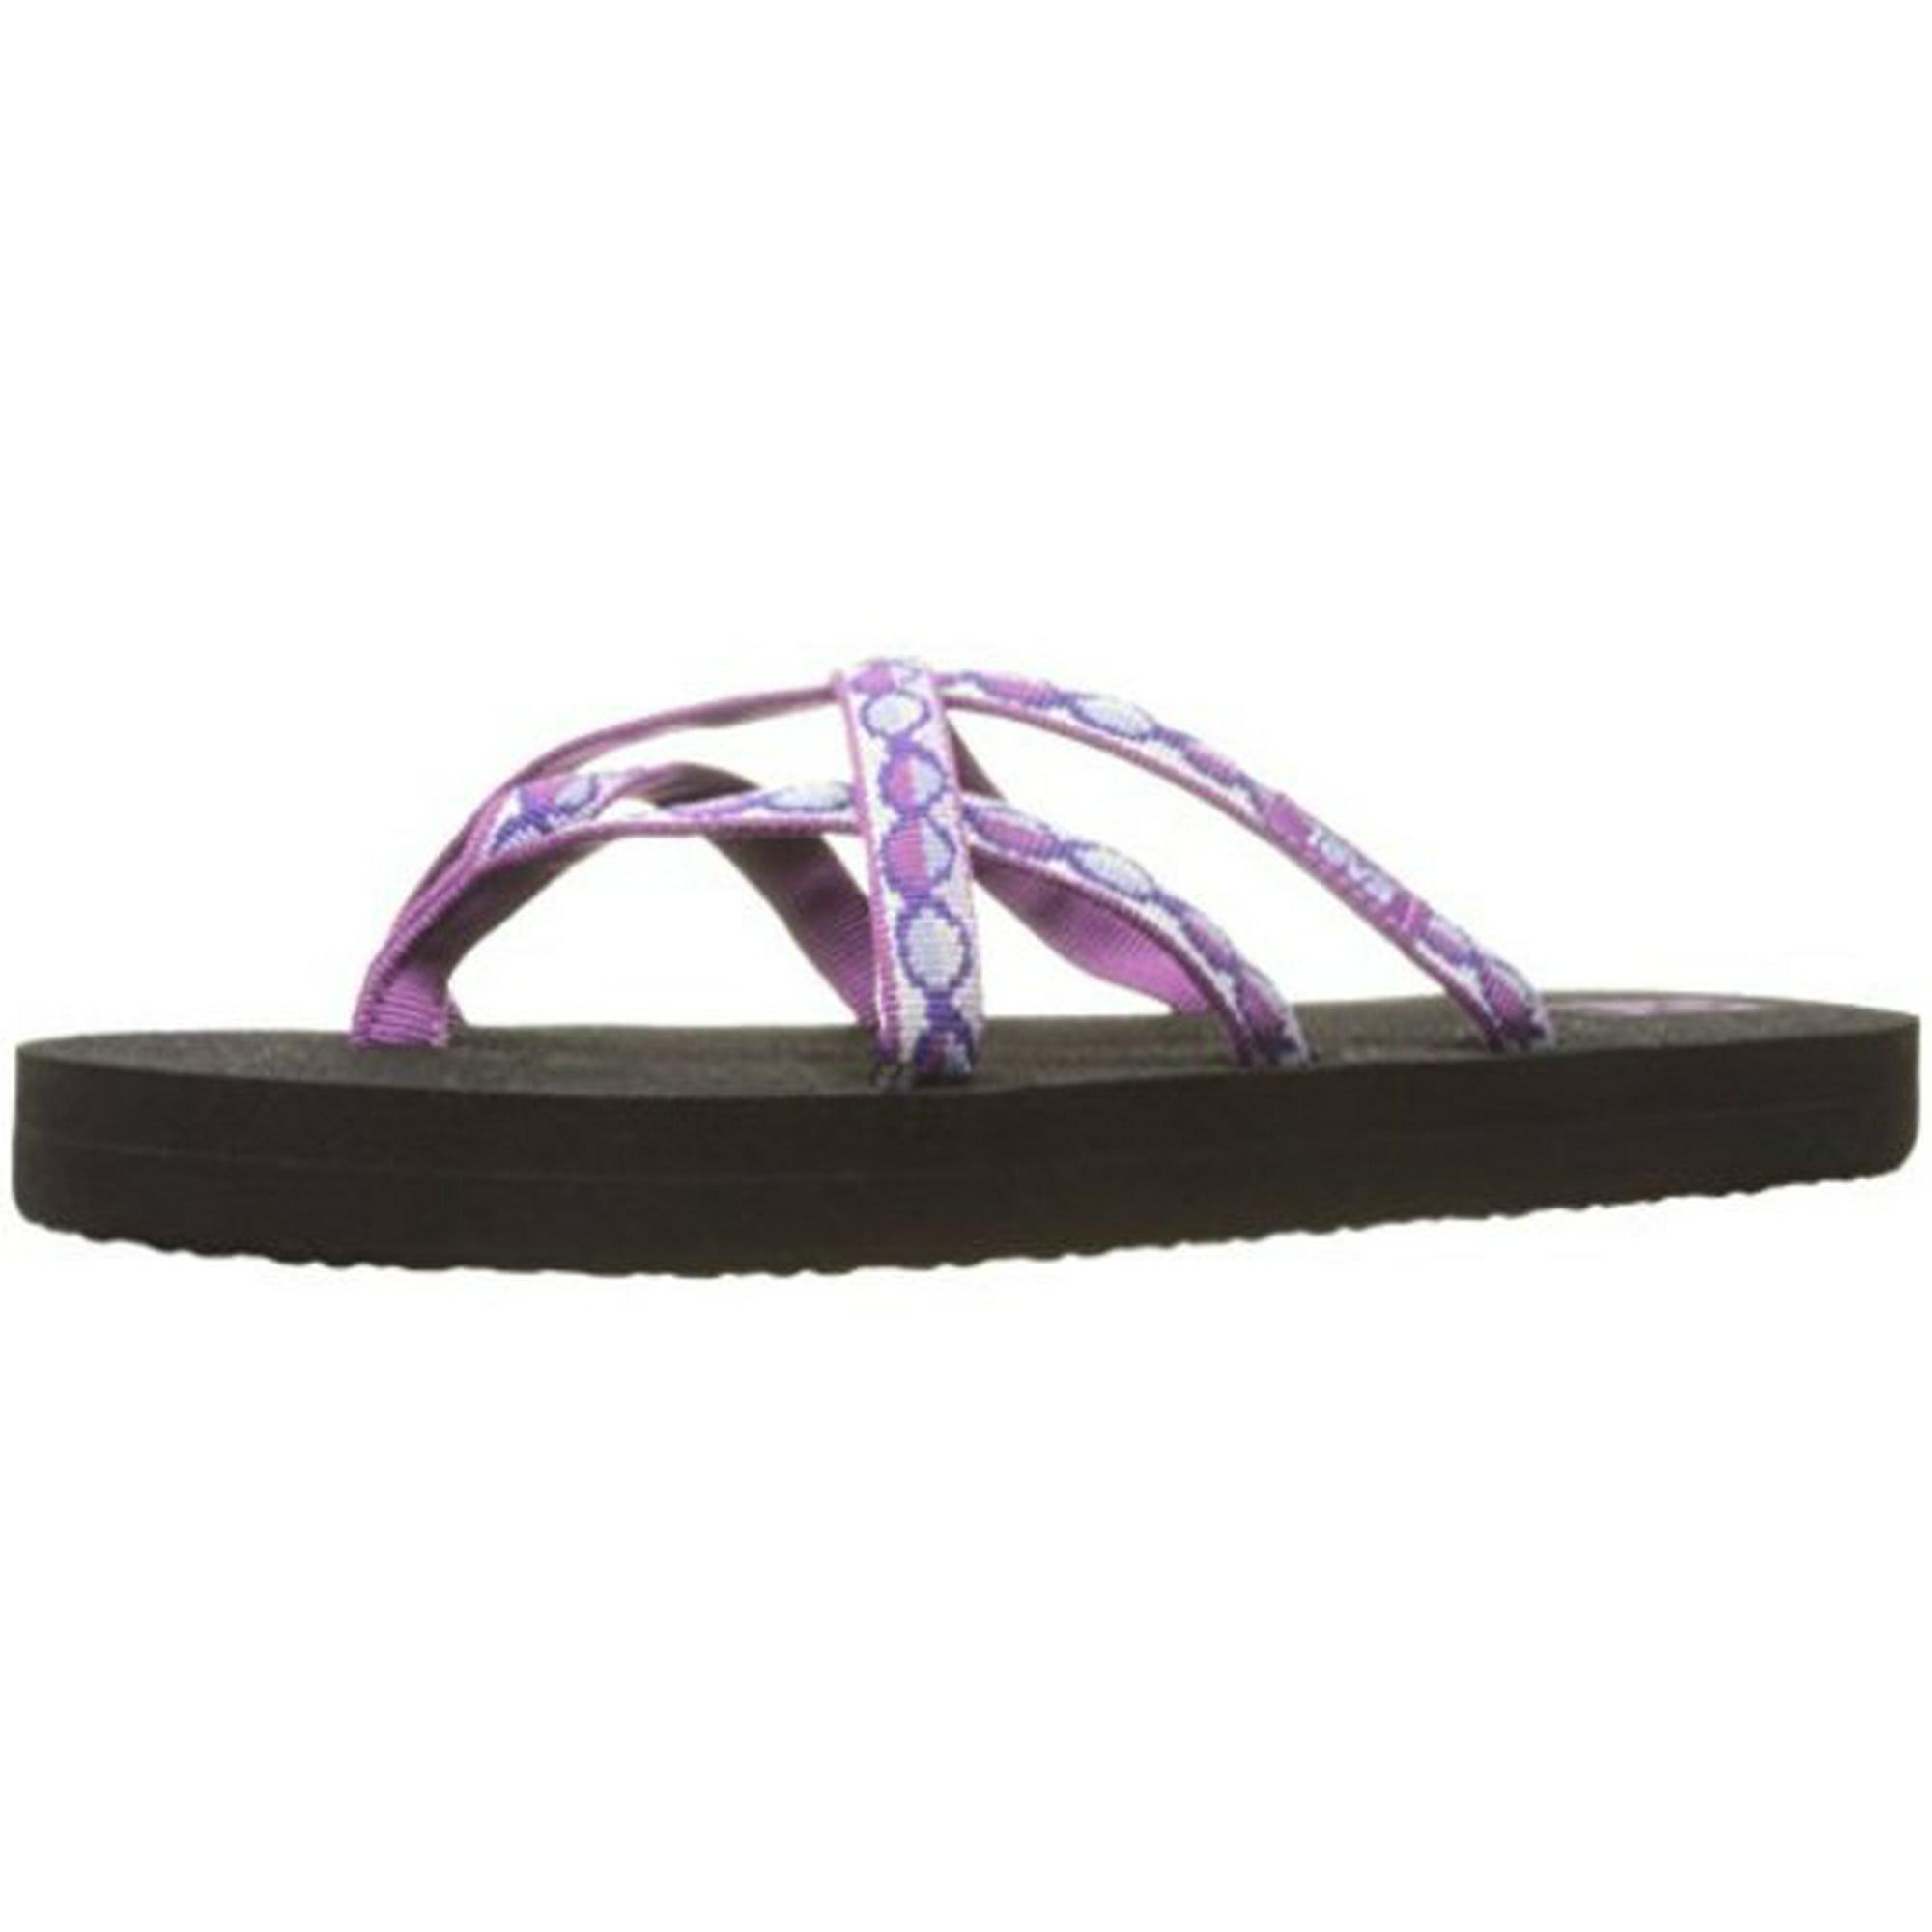 new product 1fa04 378d6 Teva Kids' Olowahu Flip-Flop